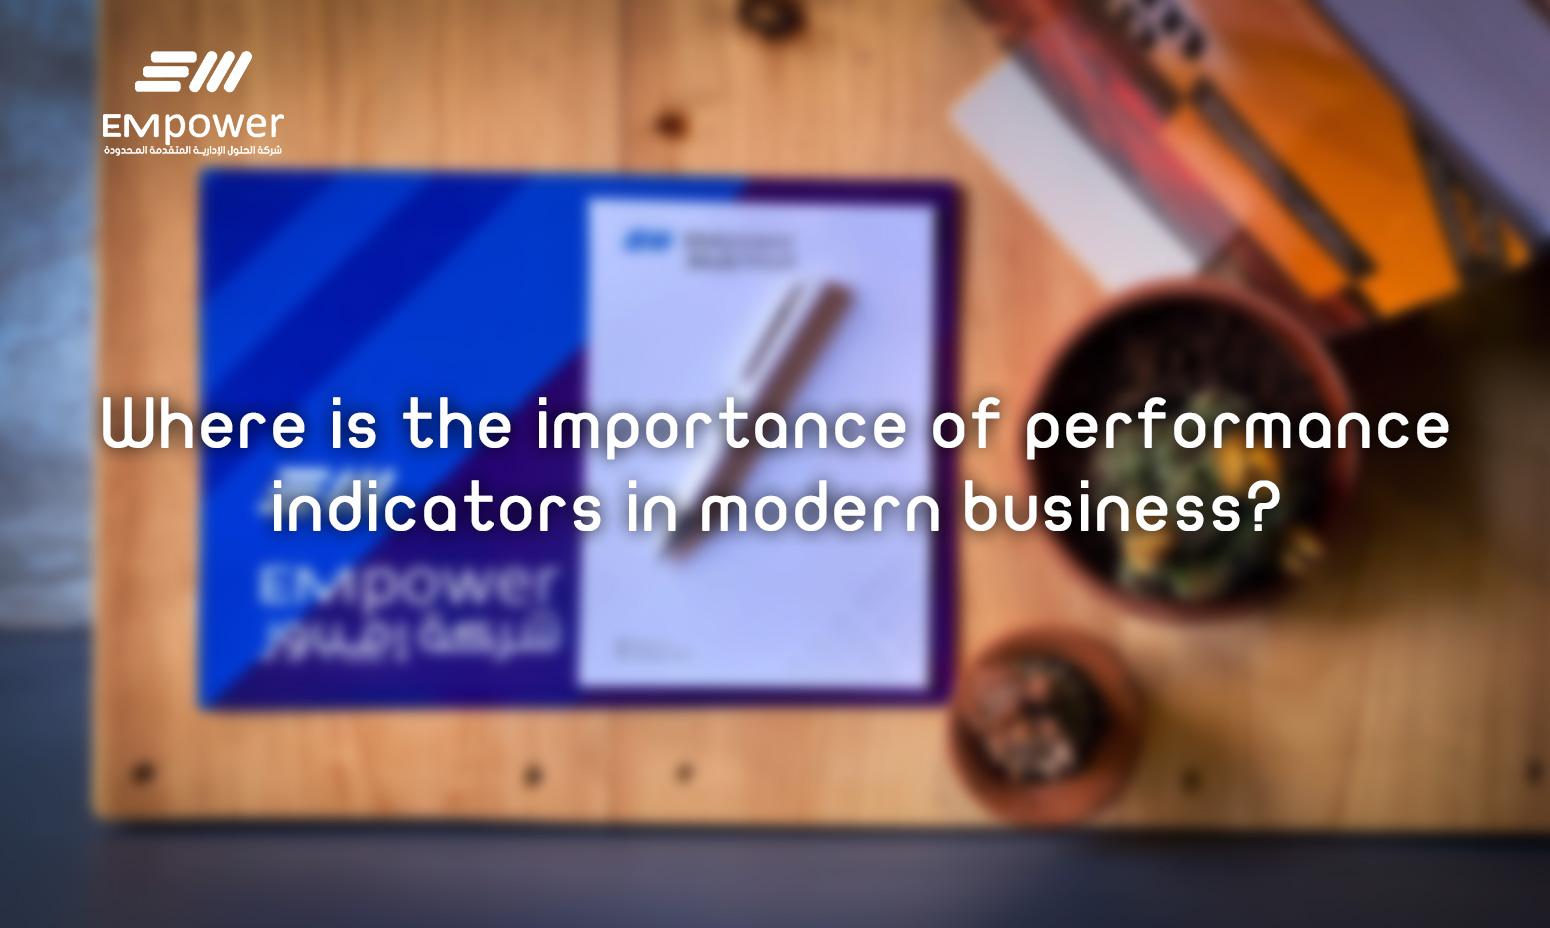 Where is the importance of performance indicators in modern business - أين تكمن أهمية مؤشرات الأداء في الاعمال الحديثة؟